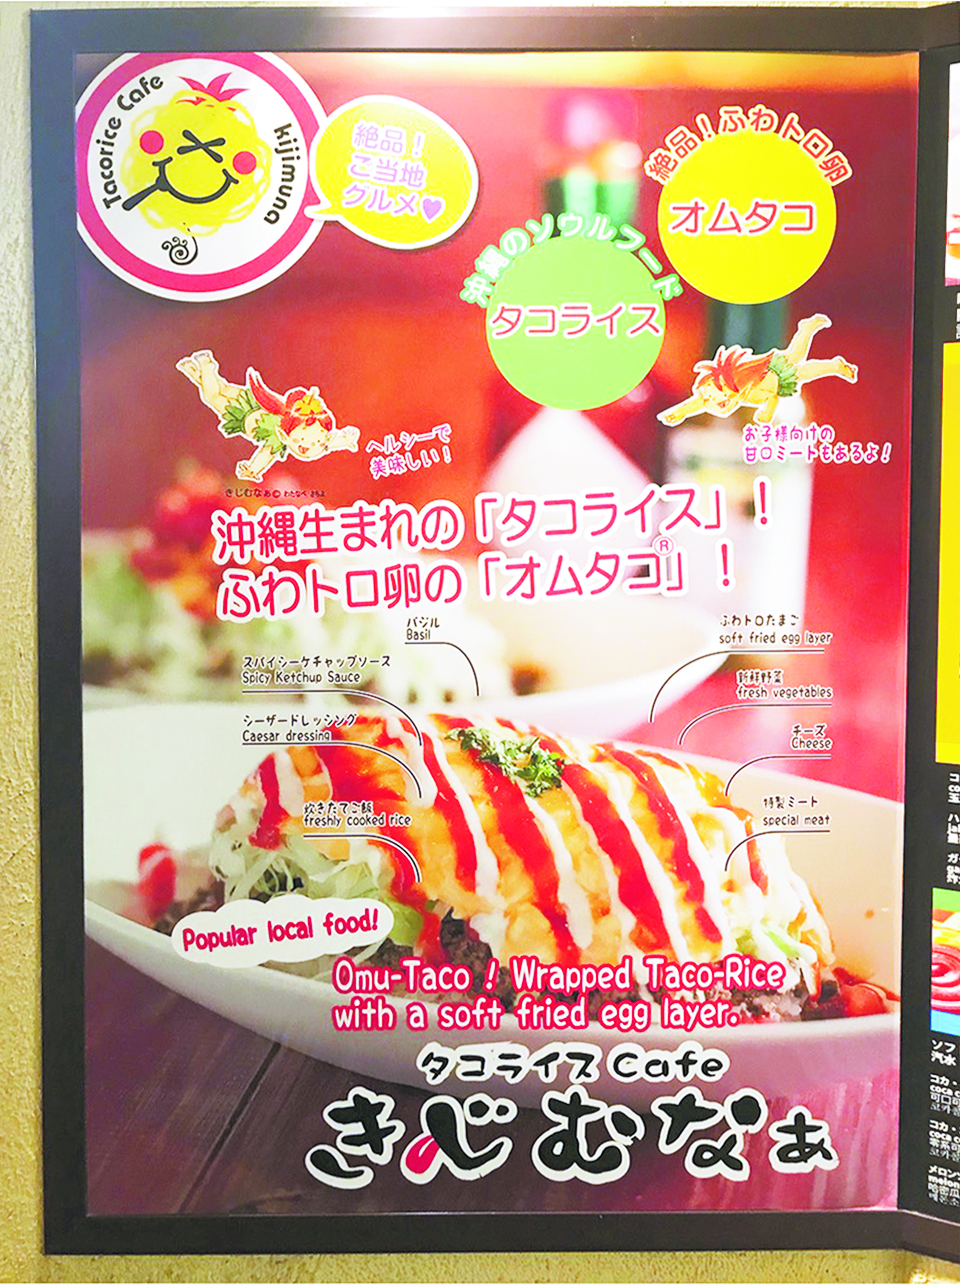 The Taco Rice Café Kijimuna menu.